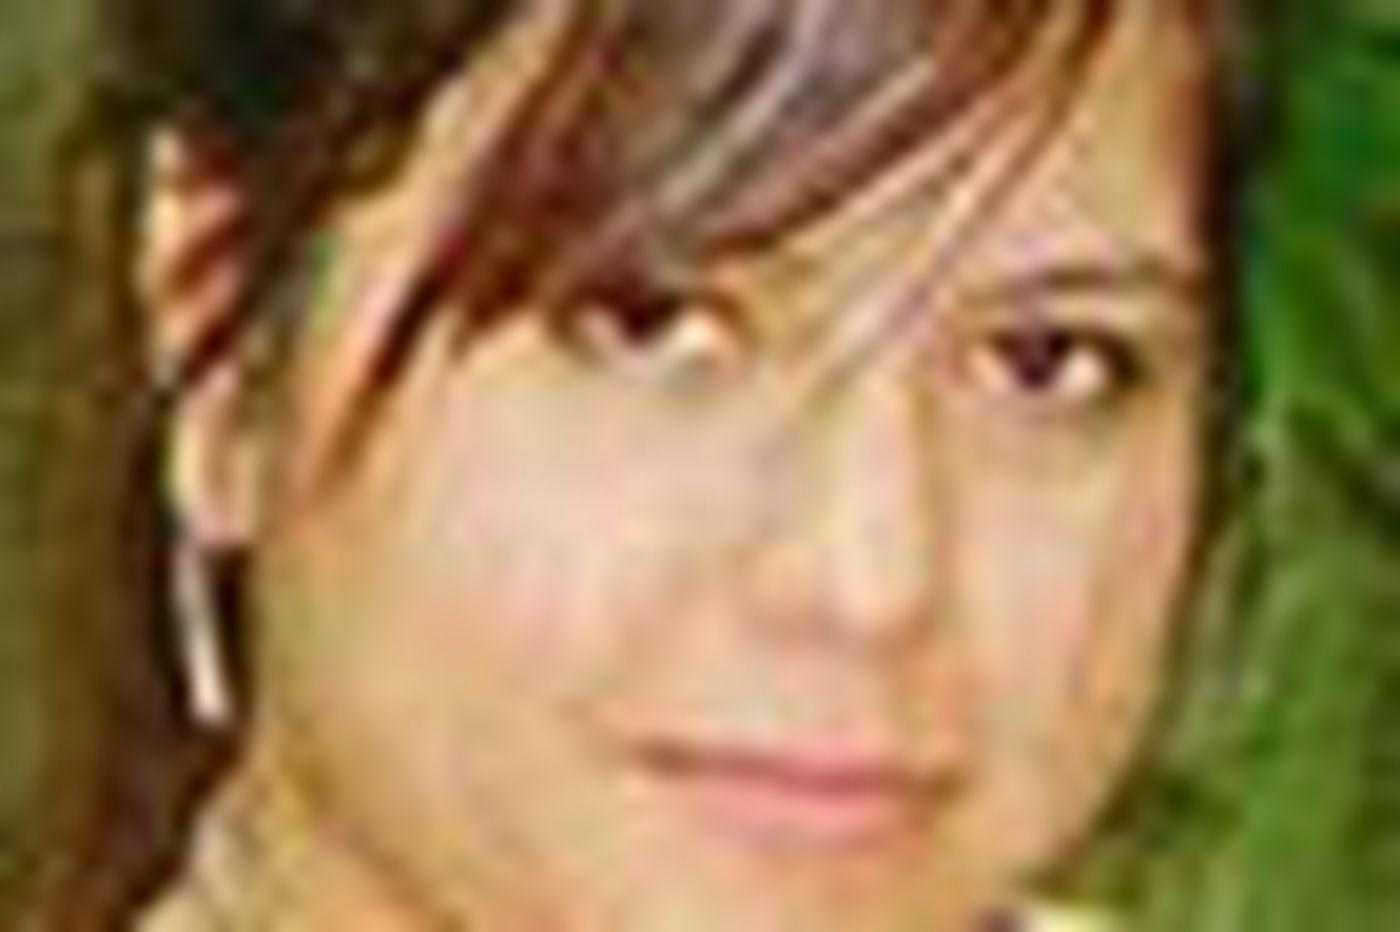 Group works to halt deportation of suicidal woman